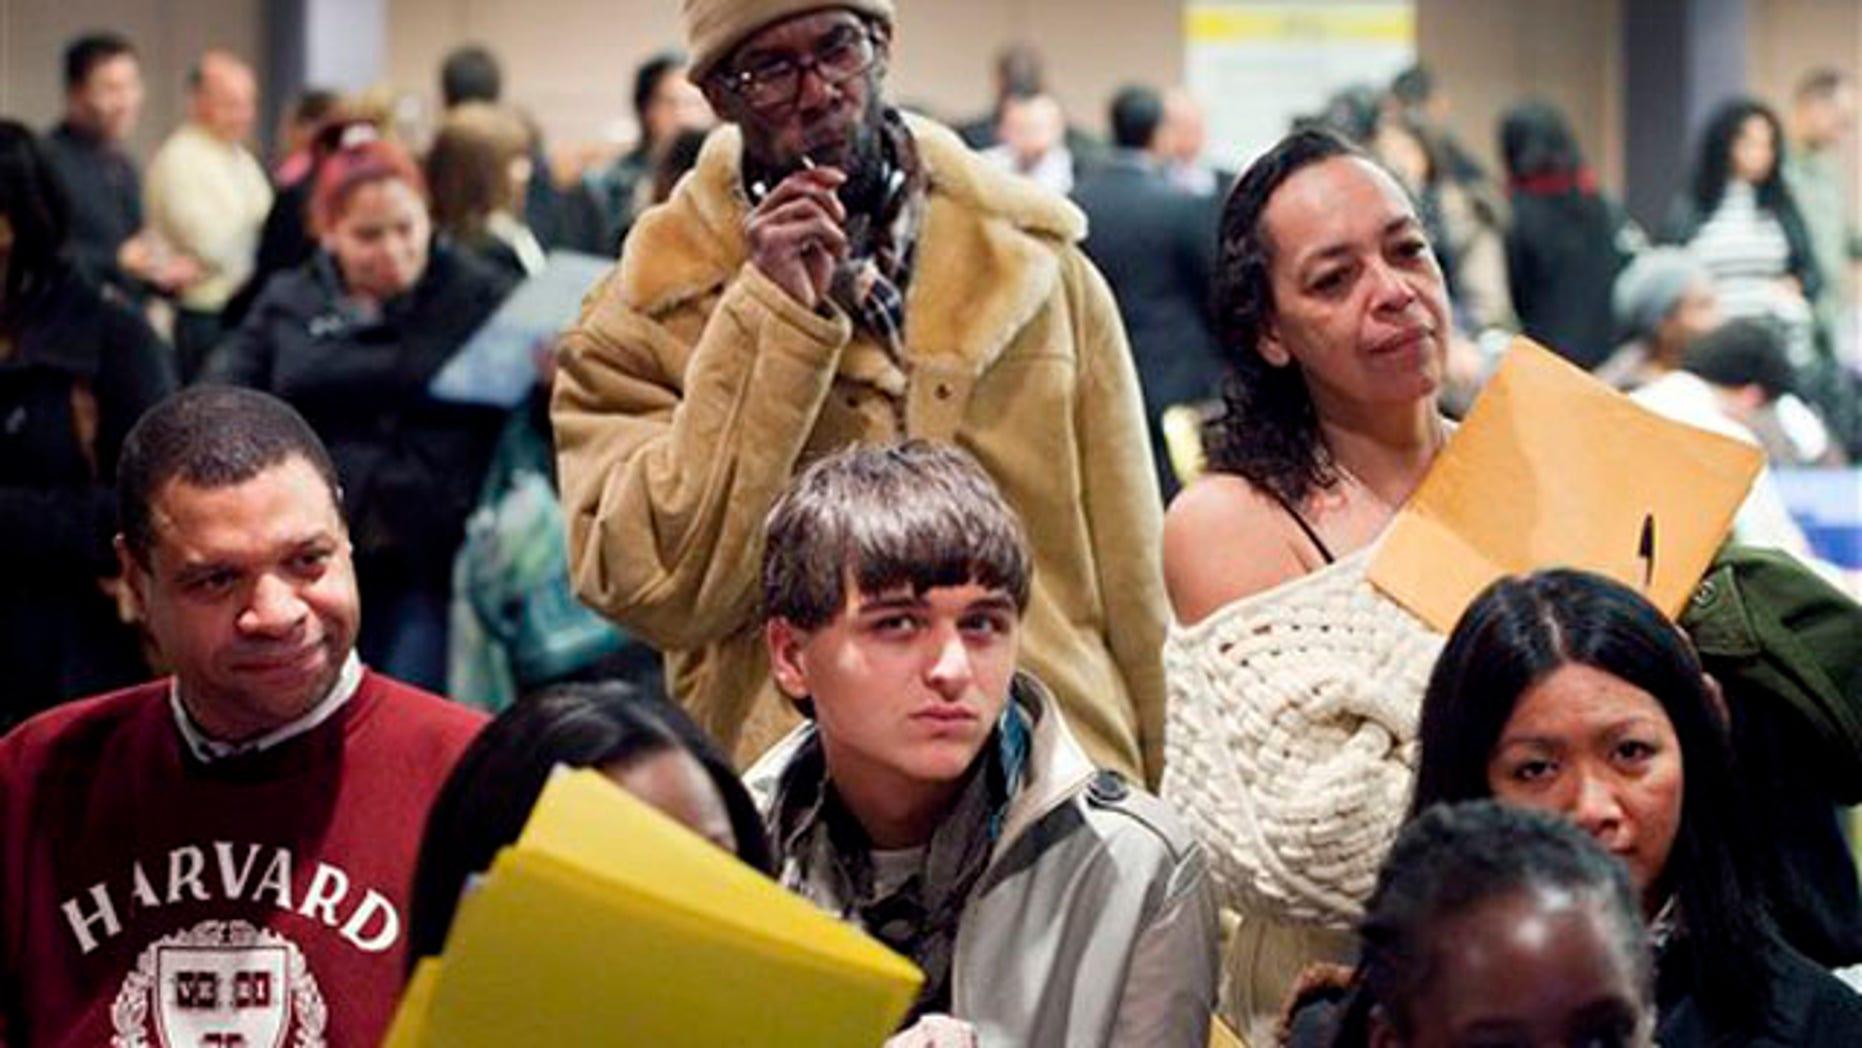 Feb. 22, 2012: Job seekers attend a National Career Fair in New York.